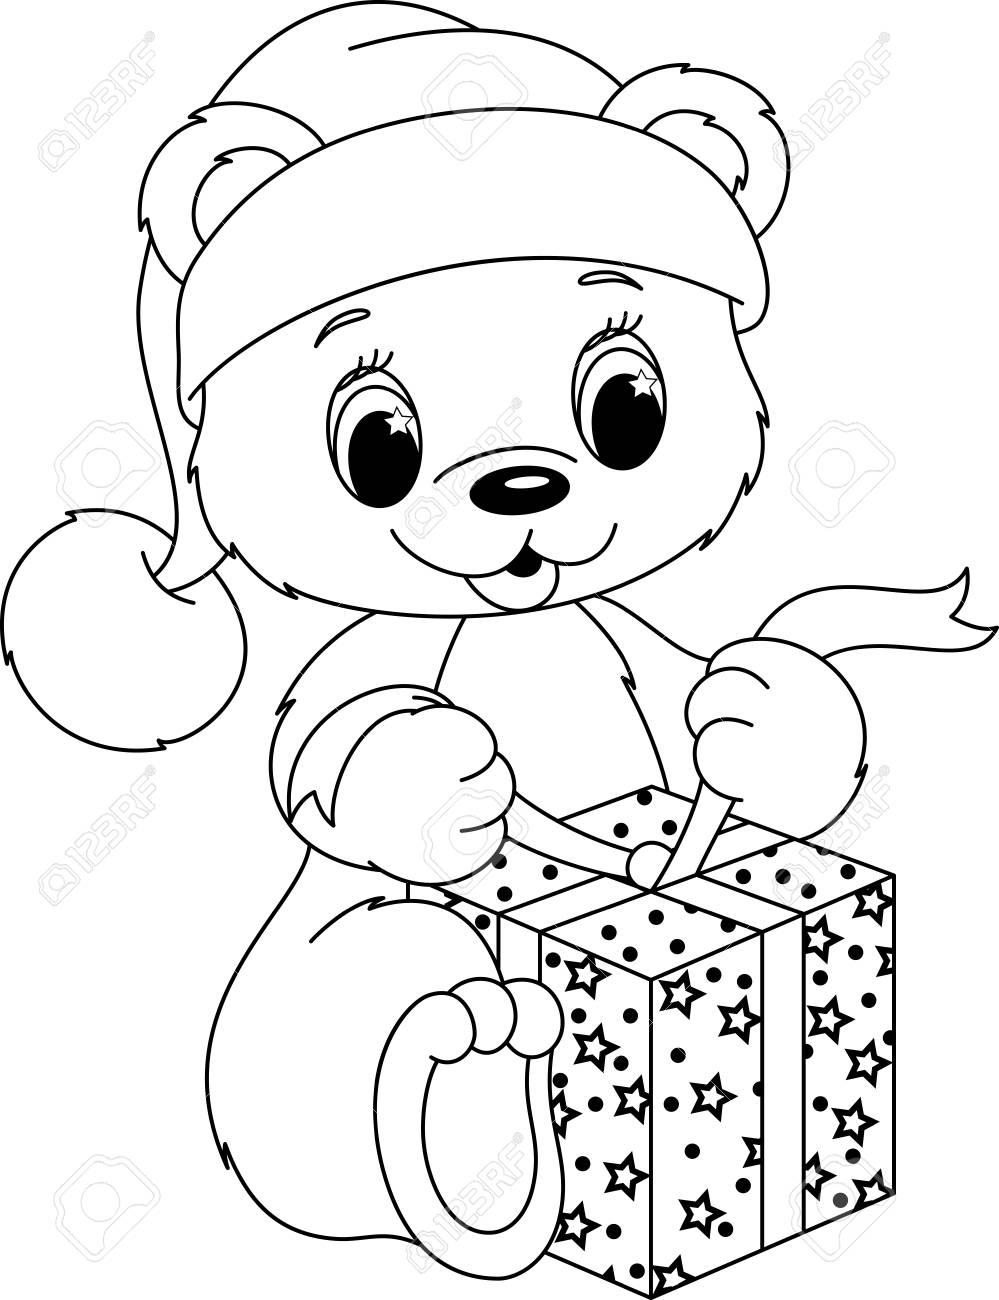 - Christmas Teddy Bear Coloring Page Royalty Free Cliparts, Vectors